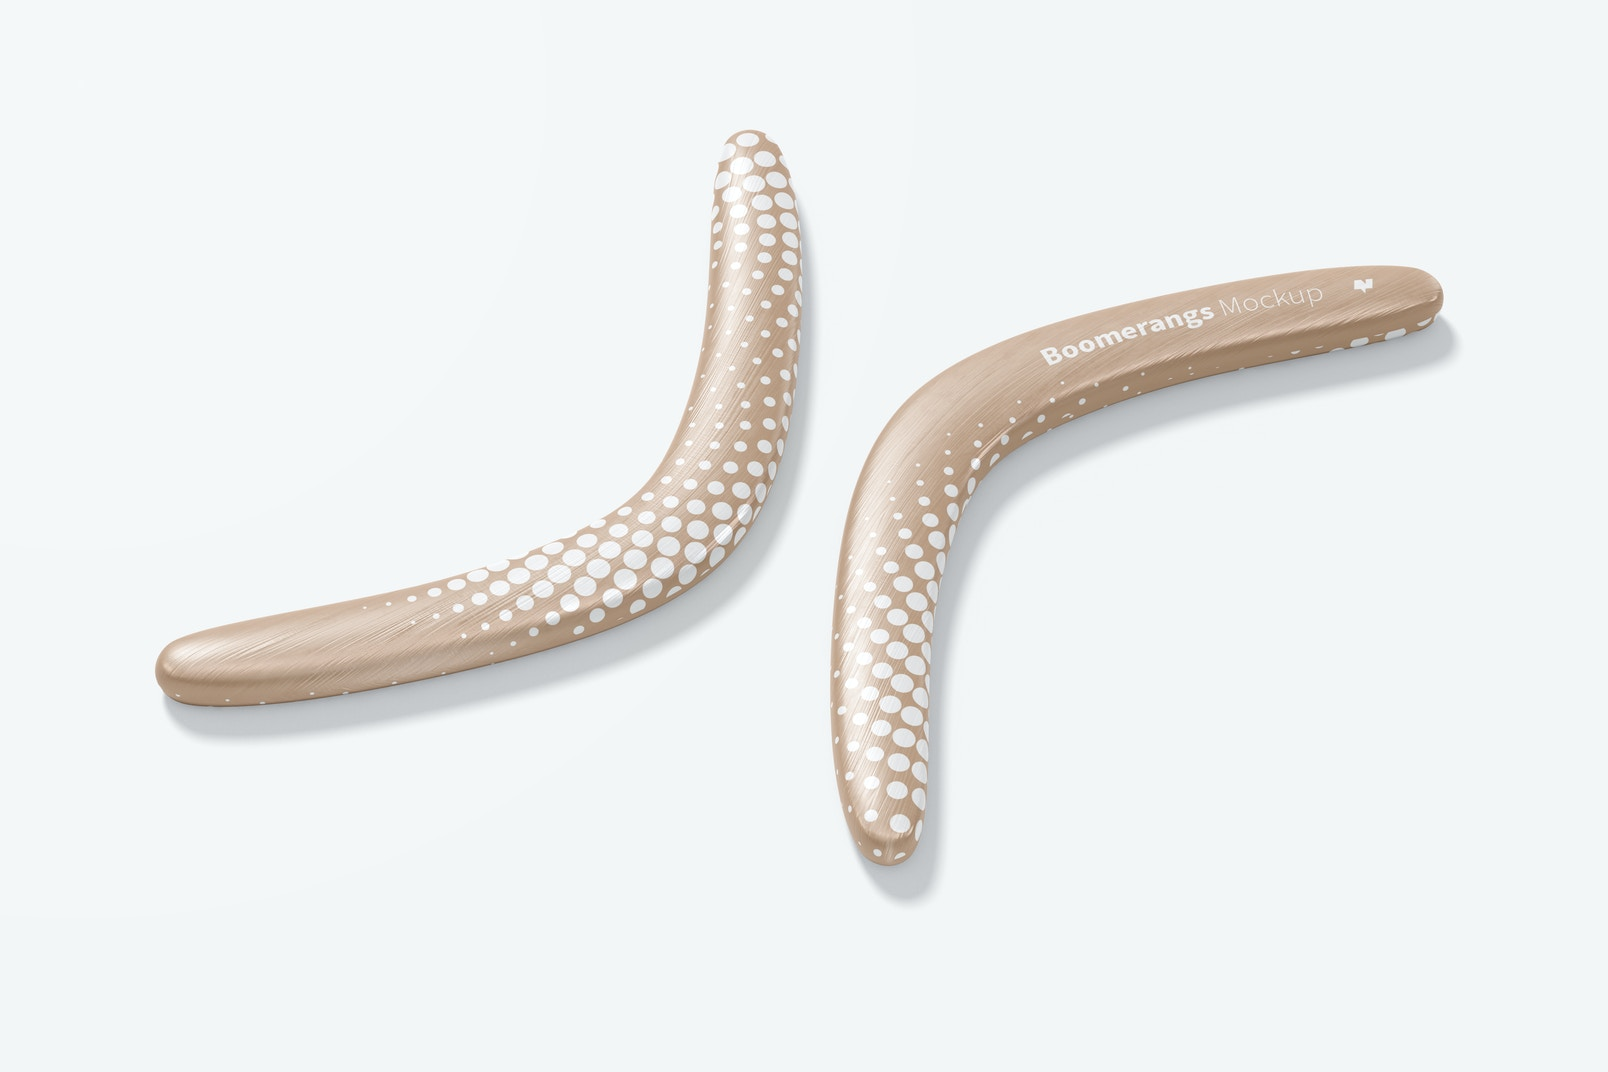 Boomerangs Mockup